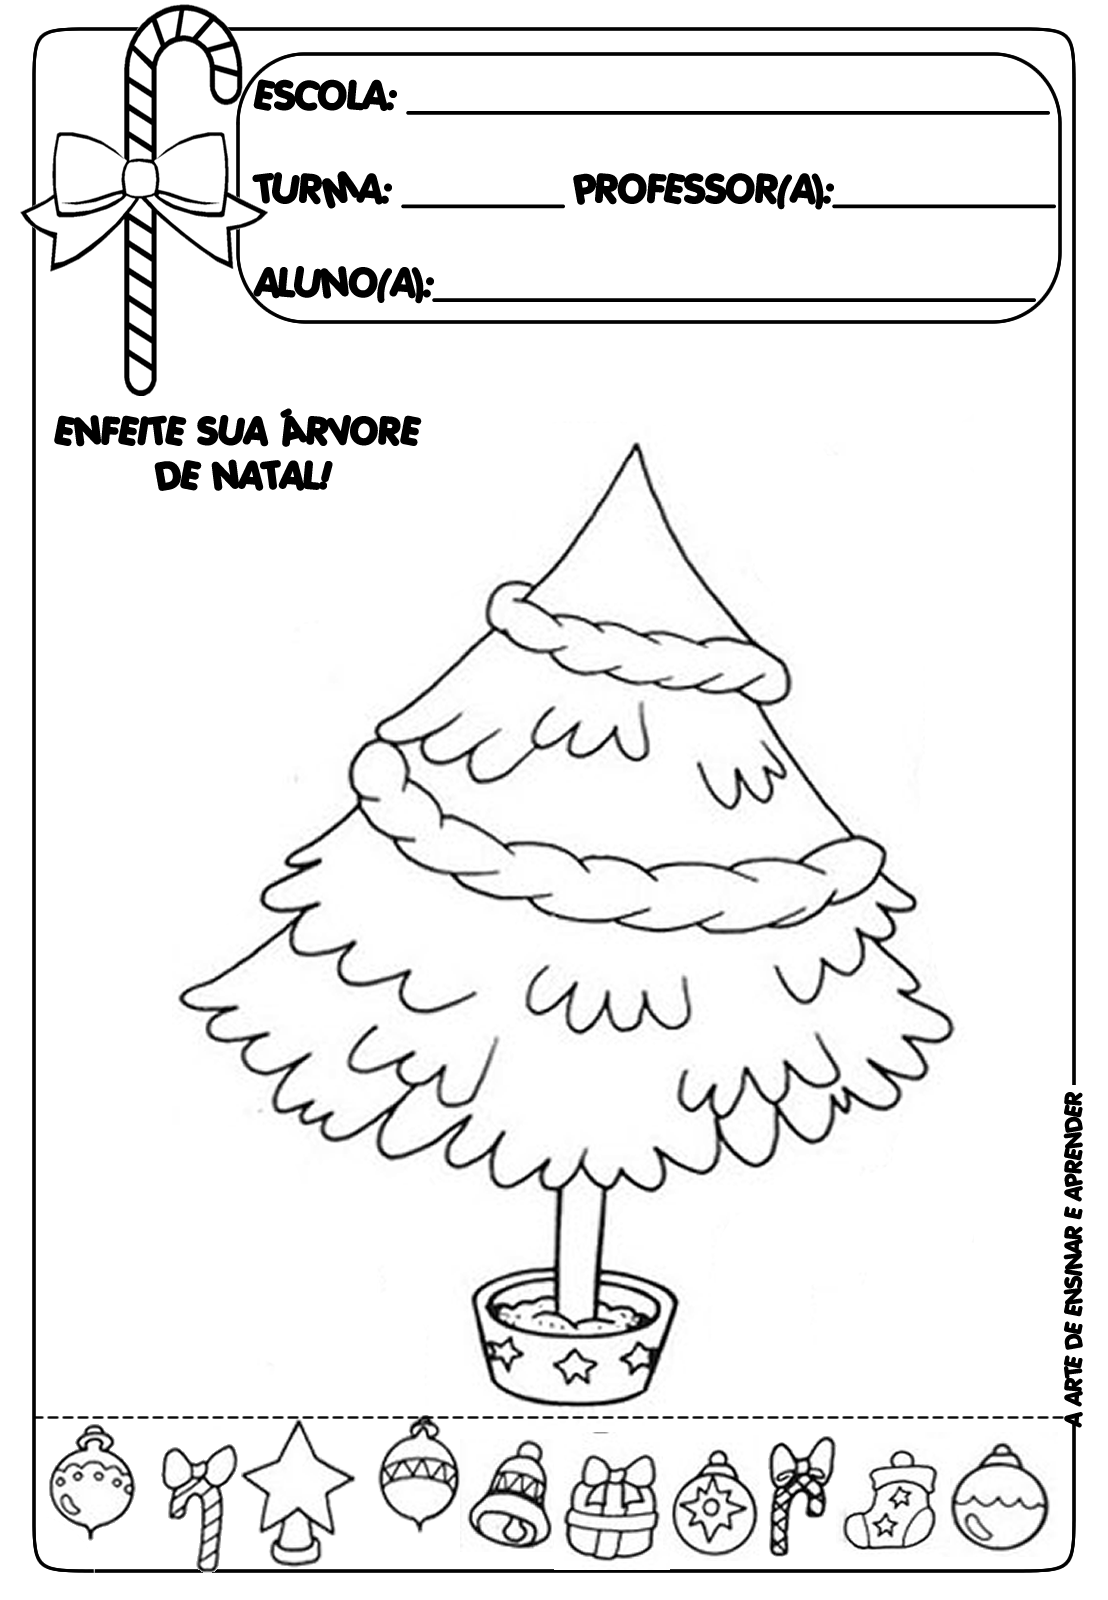 Atividades Temática Natal Atividades Natal Educação Infantil Atividades De Natal Atividades